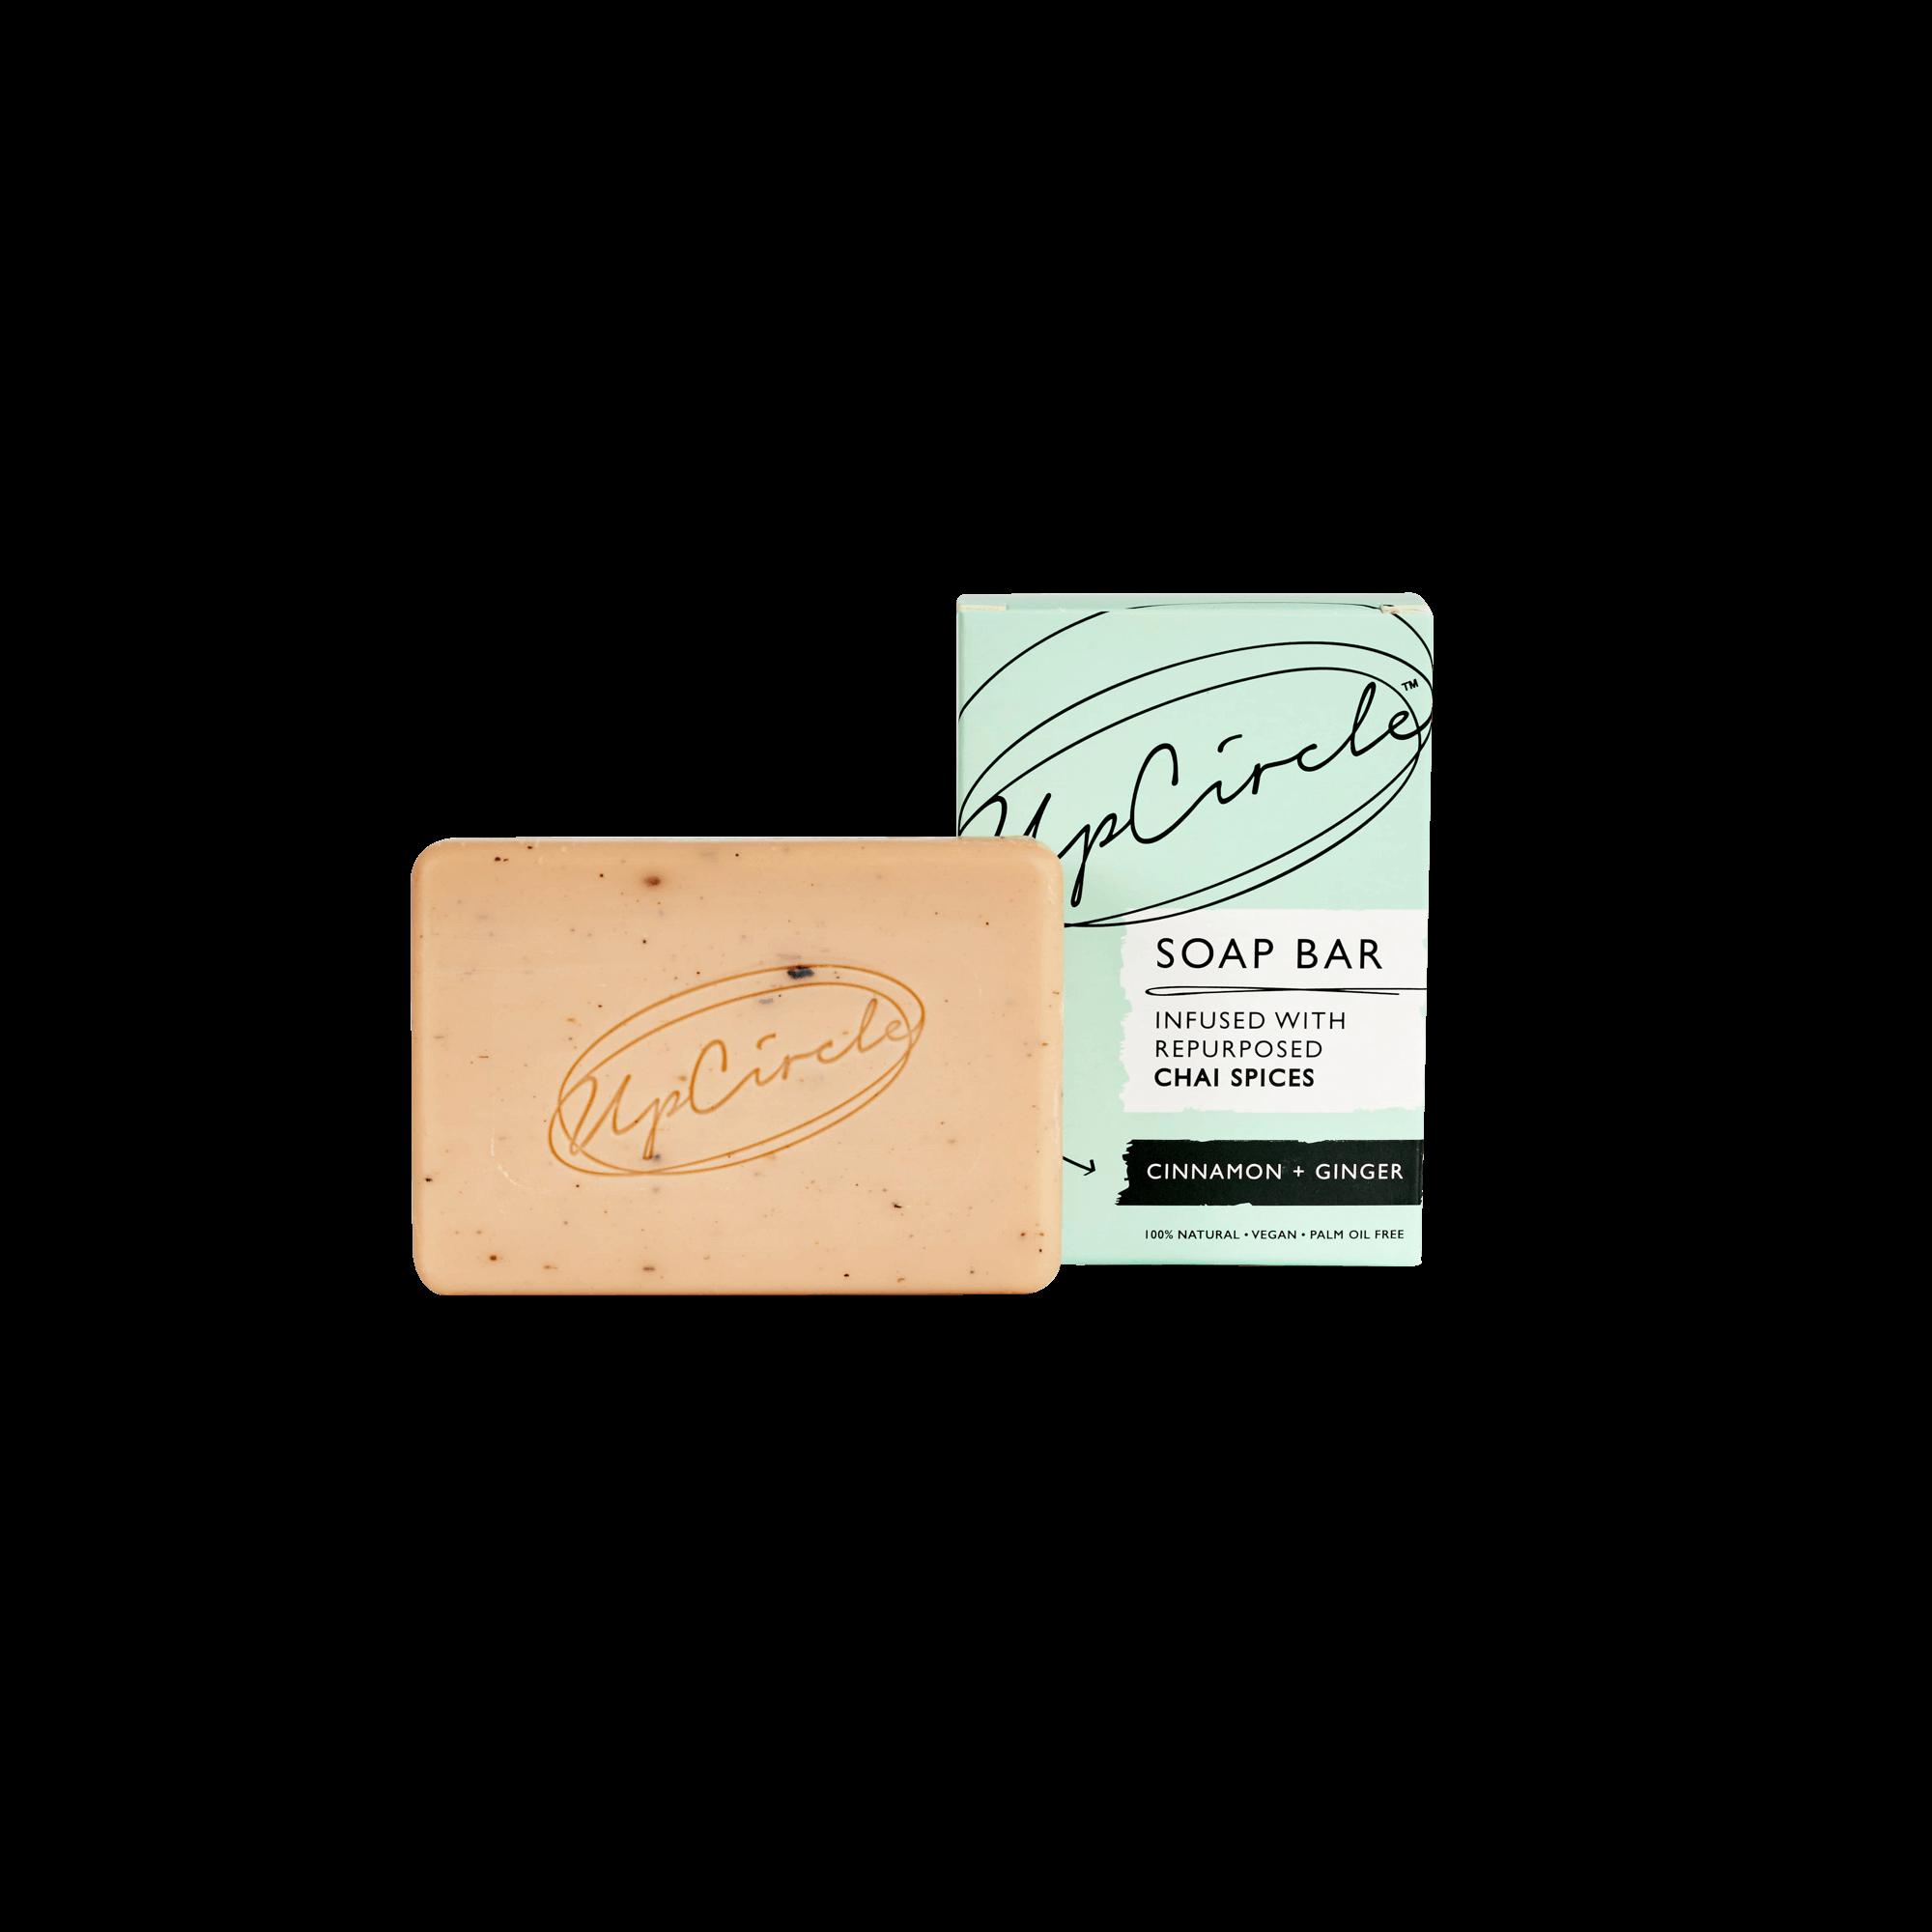 UpCircle Beauty Soap